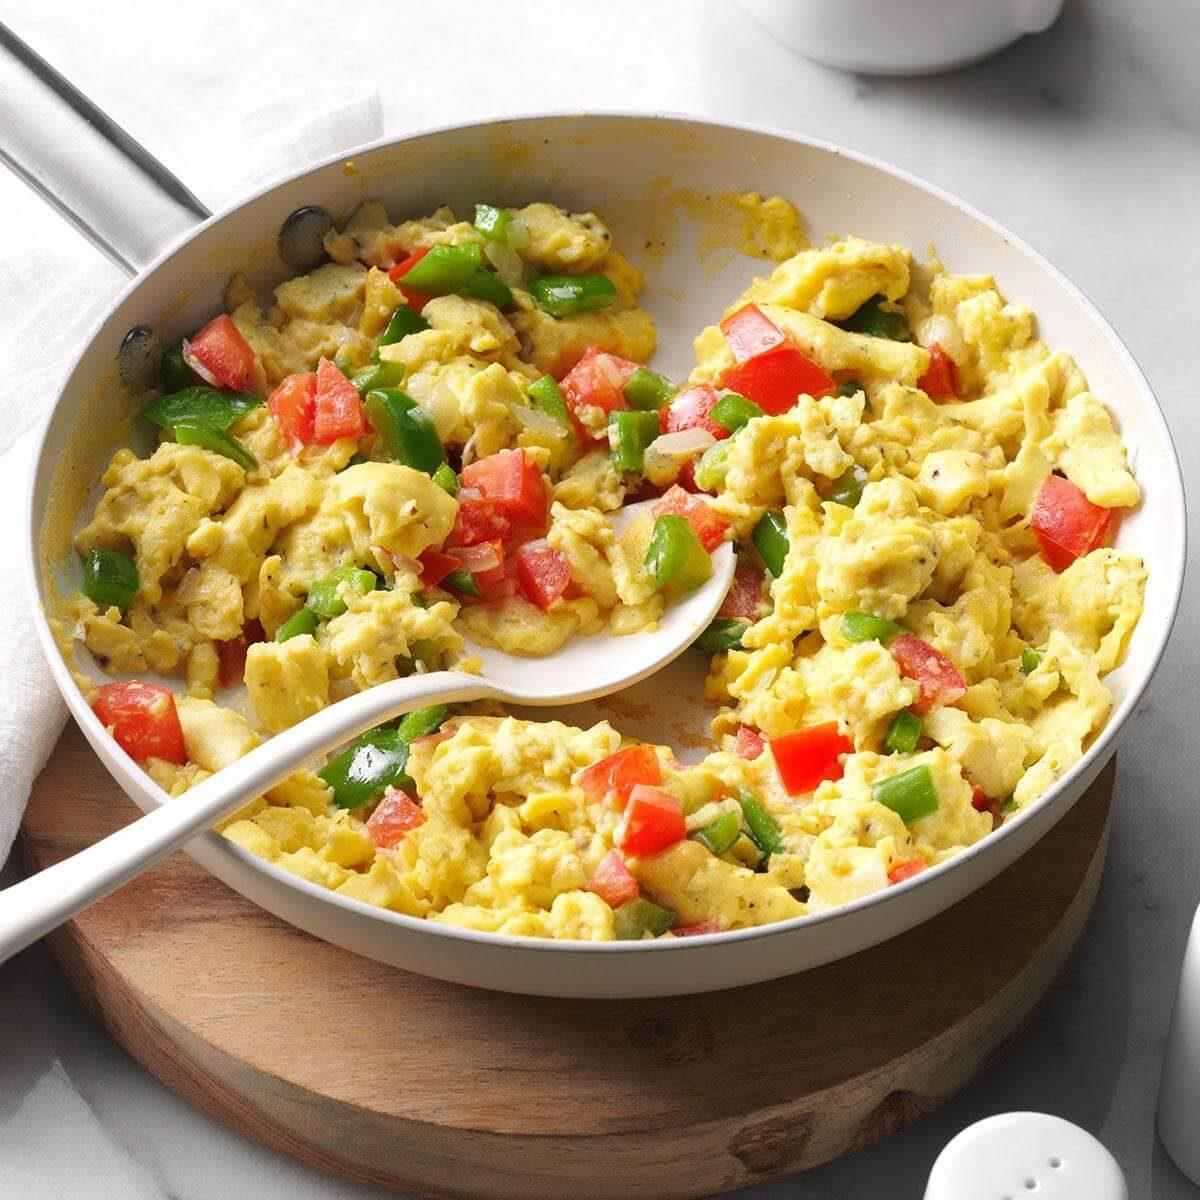 Calico Scrambled Eggs Recipe | Taste of Home